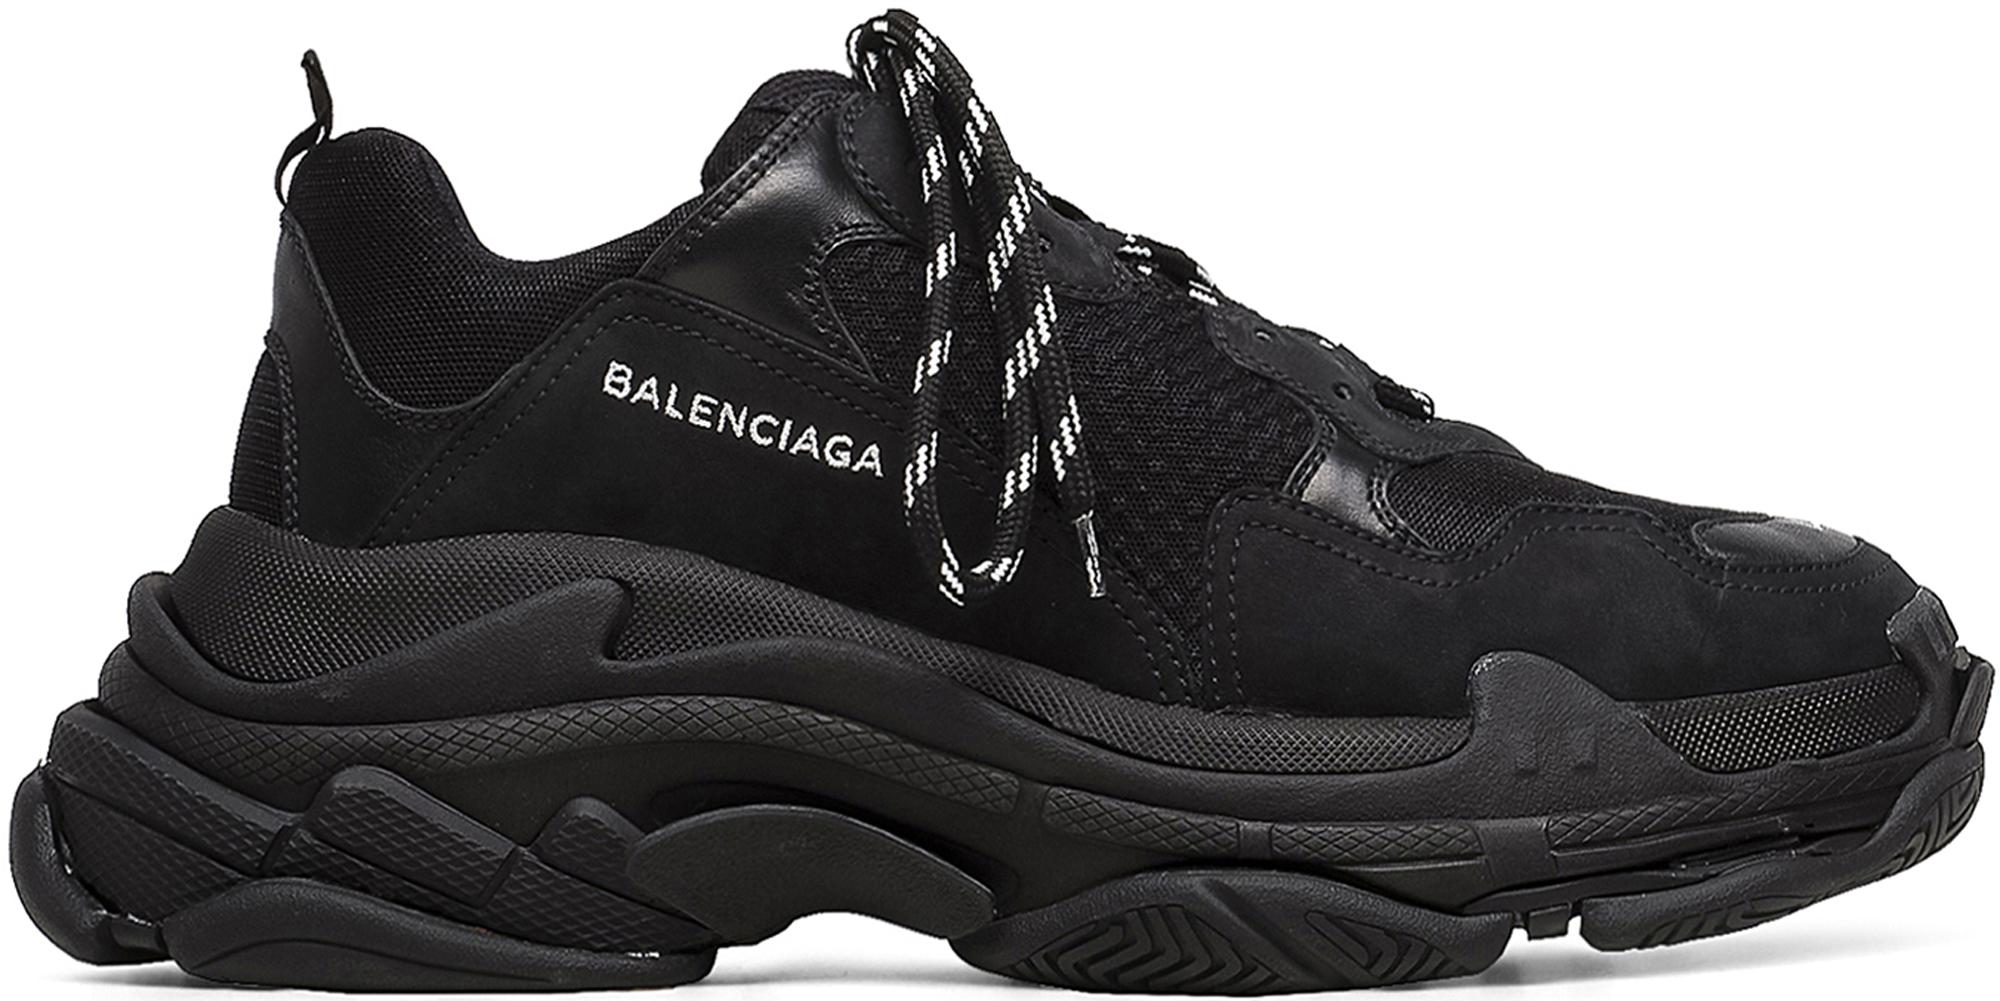 BALENCIAGA - Triple S Sneakers / Black